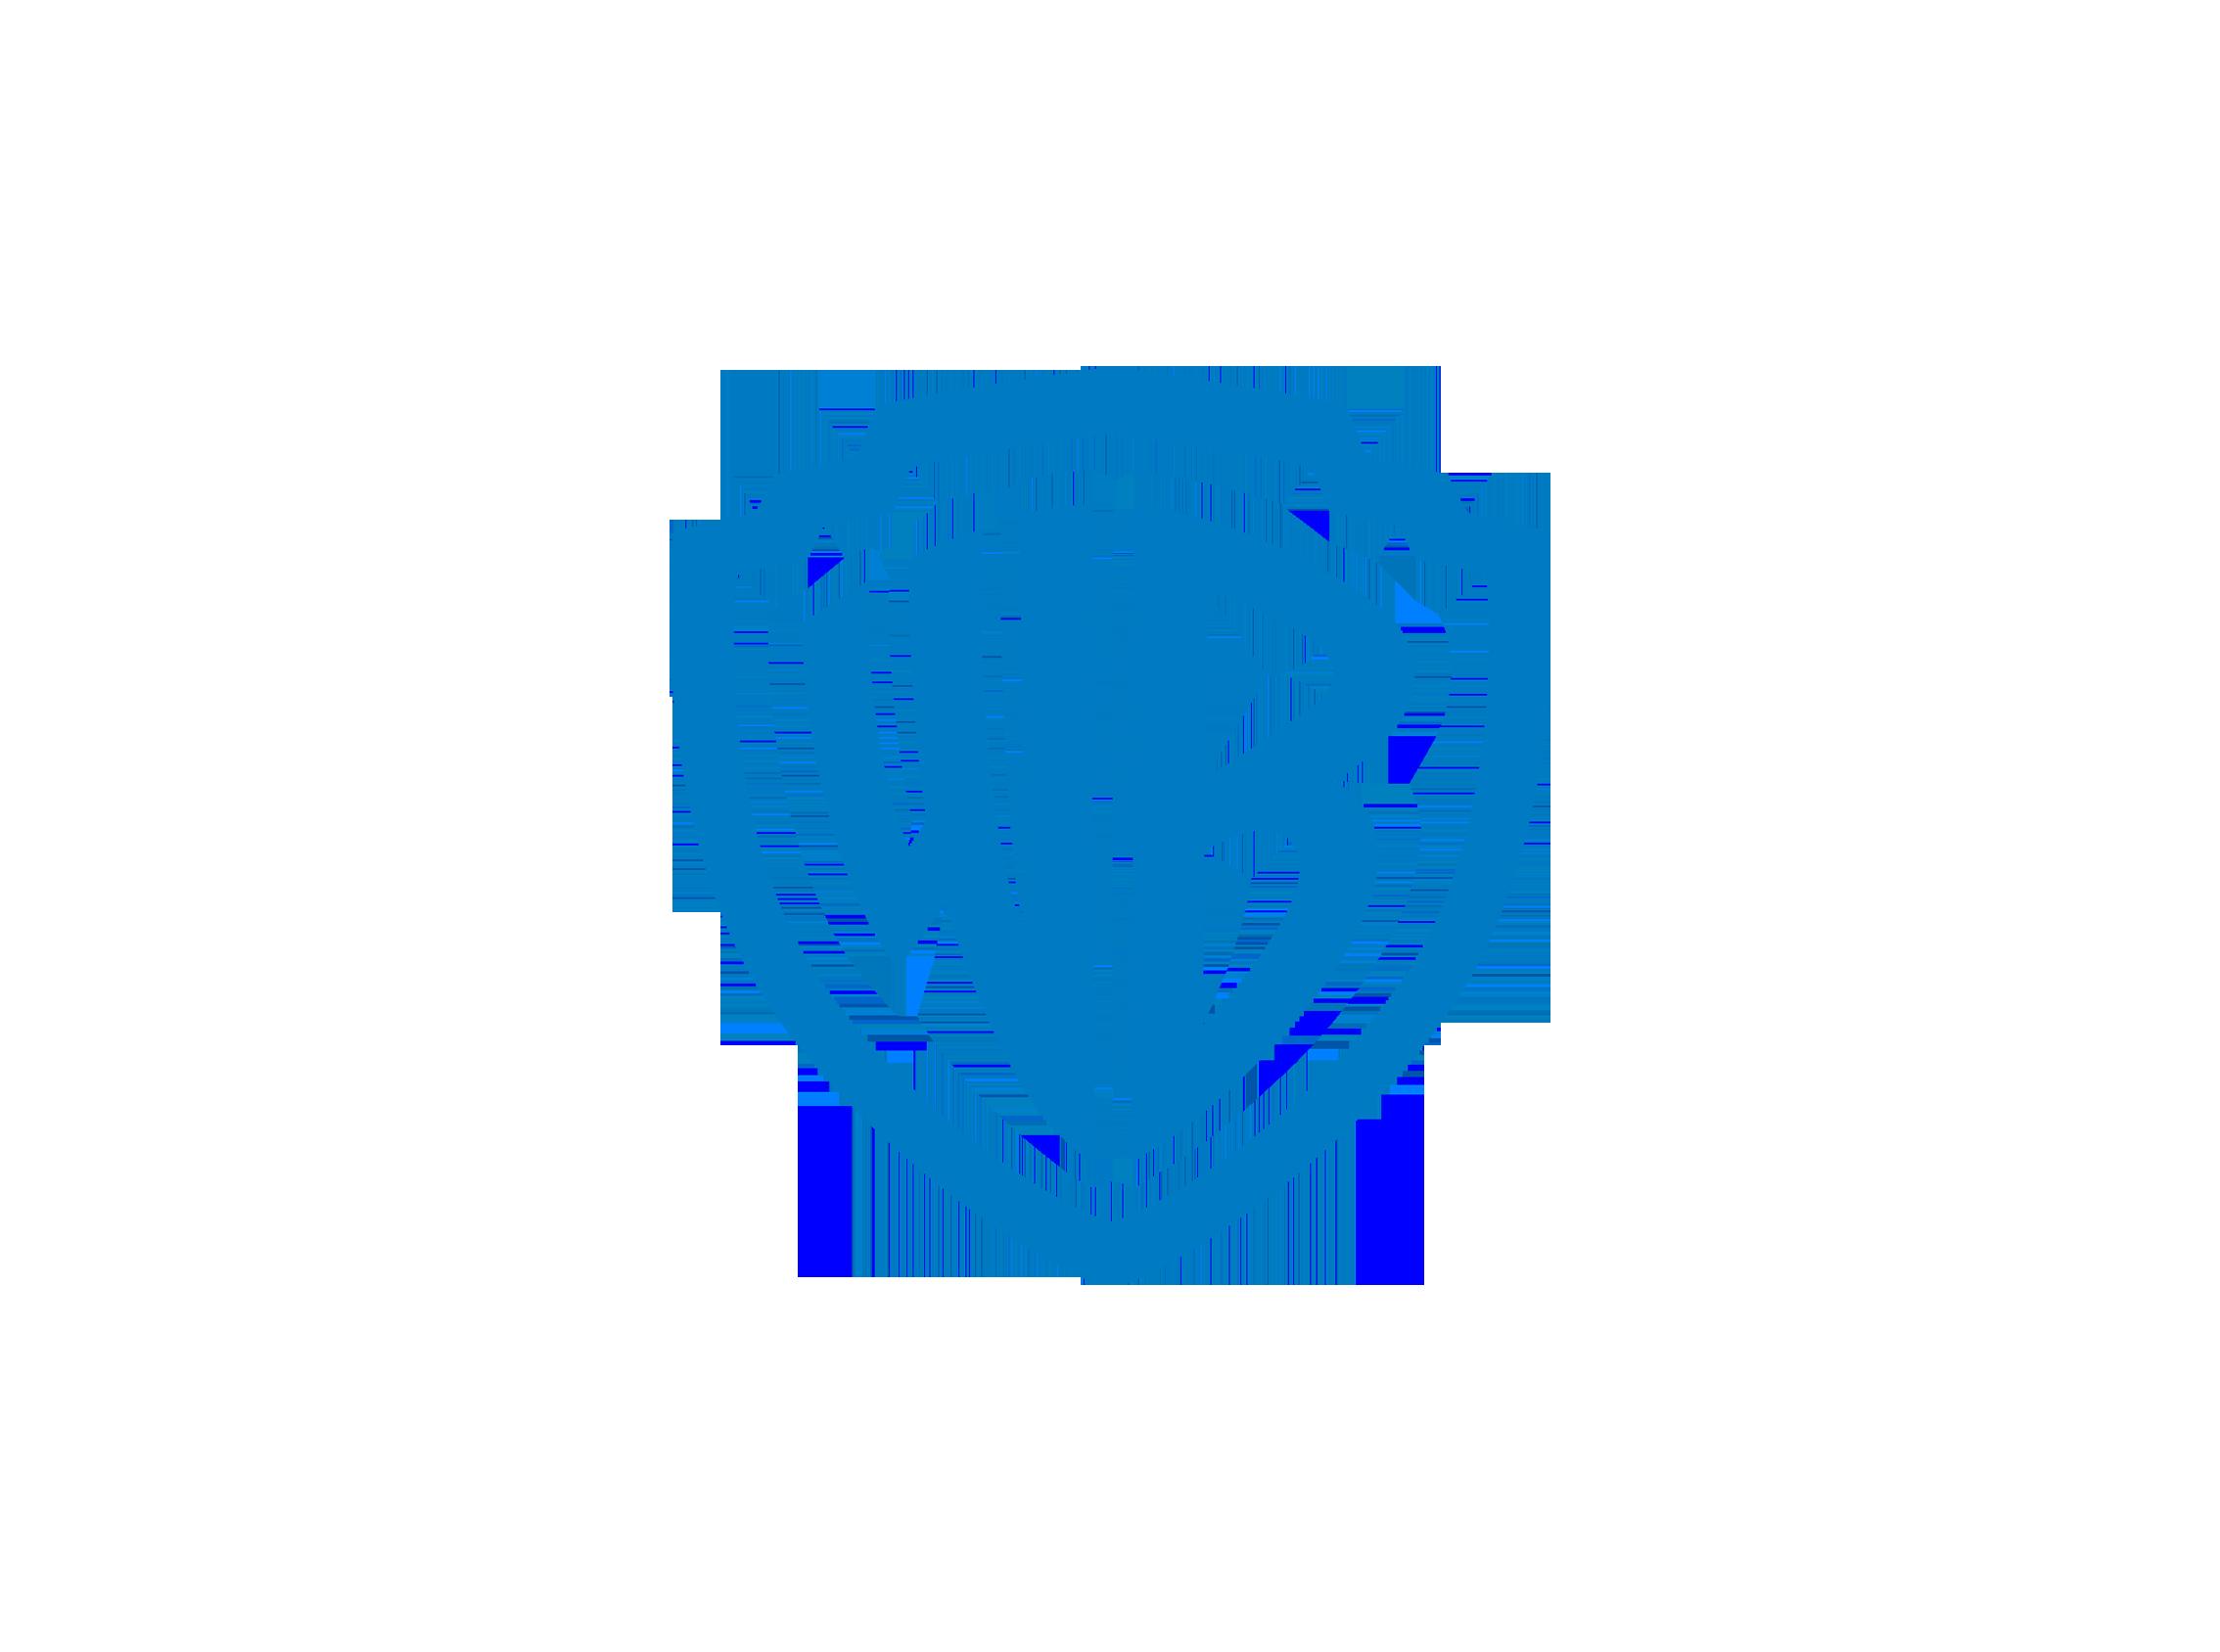 . Hdpng.com Warner Brothers Blue Logo Hdpng.com  - Warner Bros, Transparent background PNG HD thumbnail